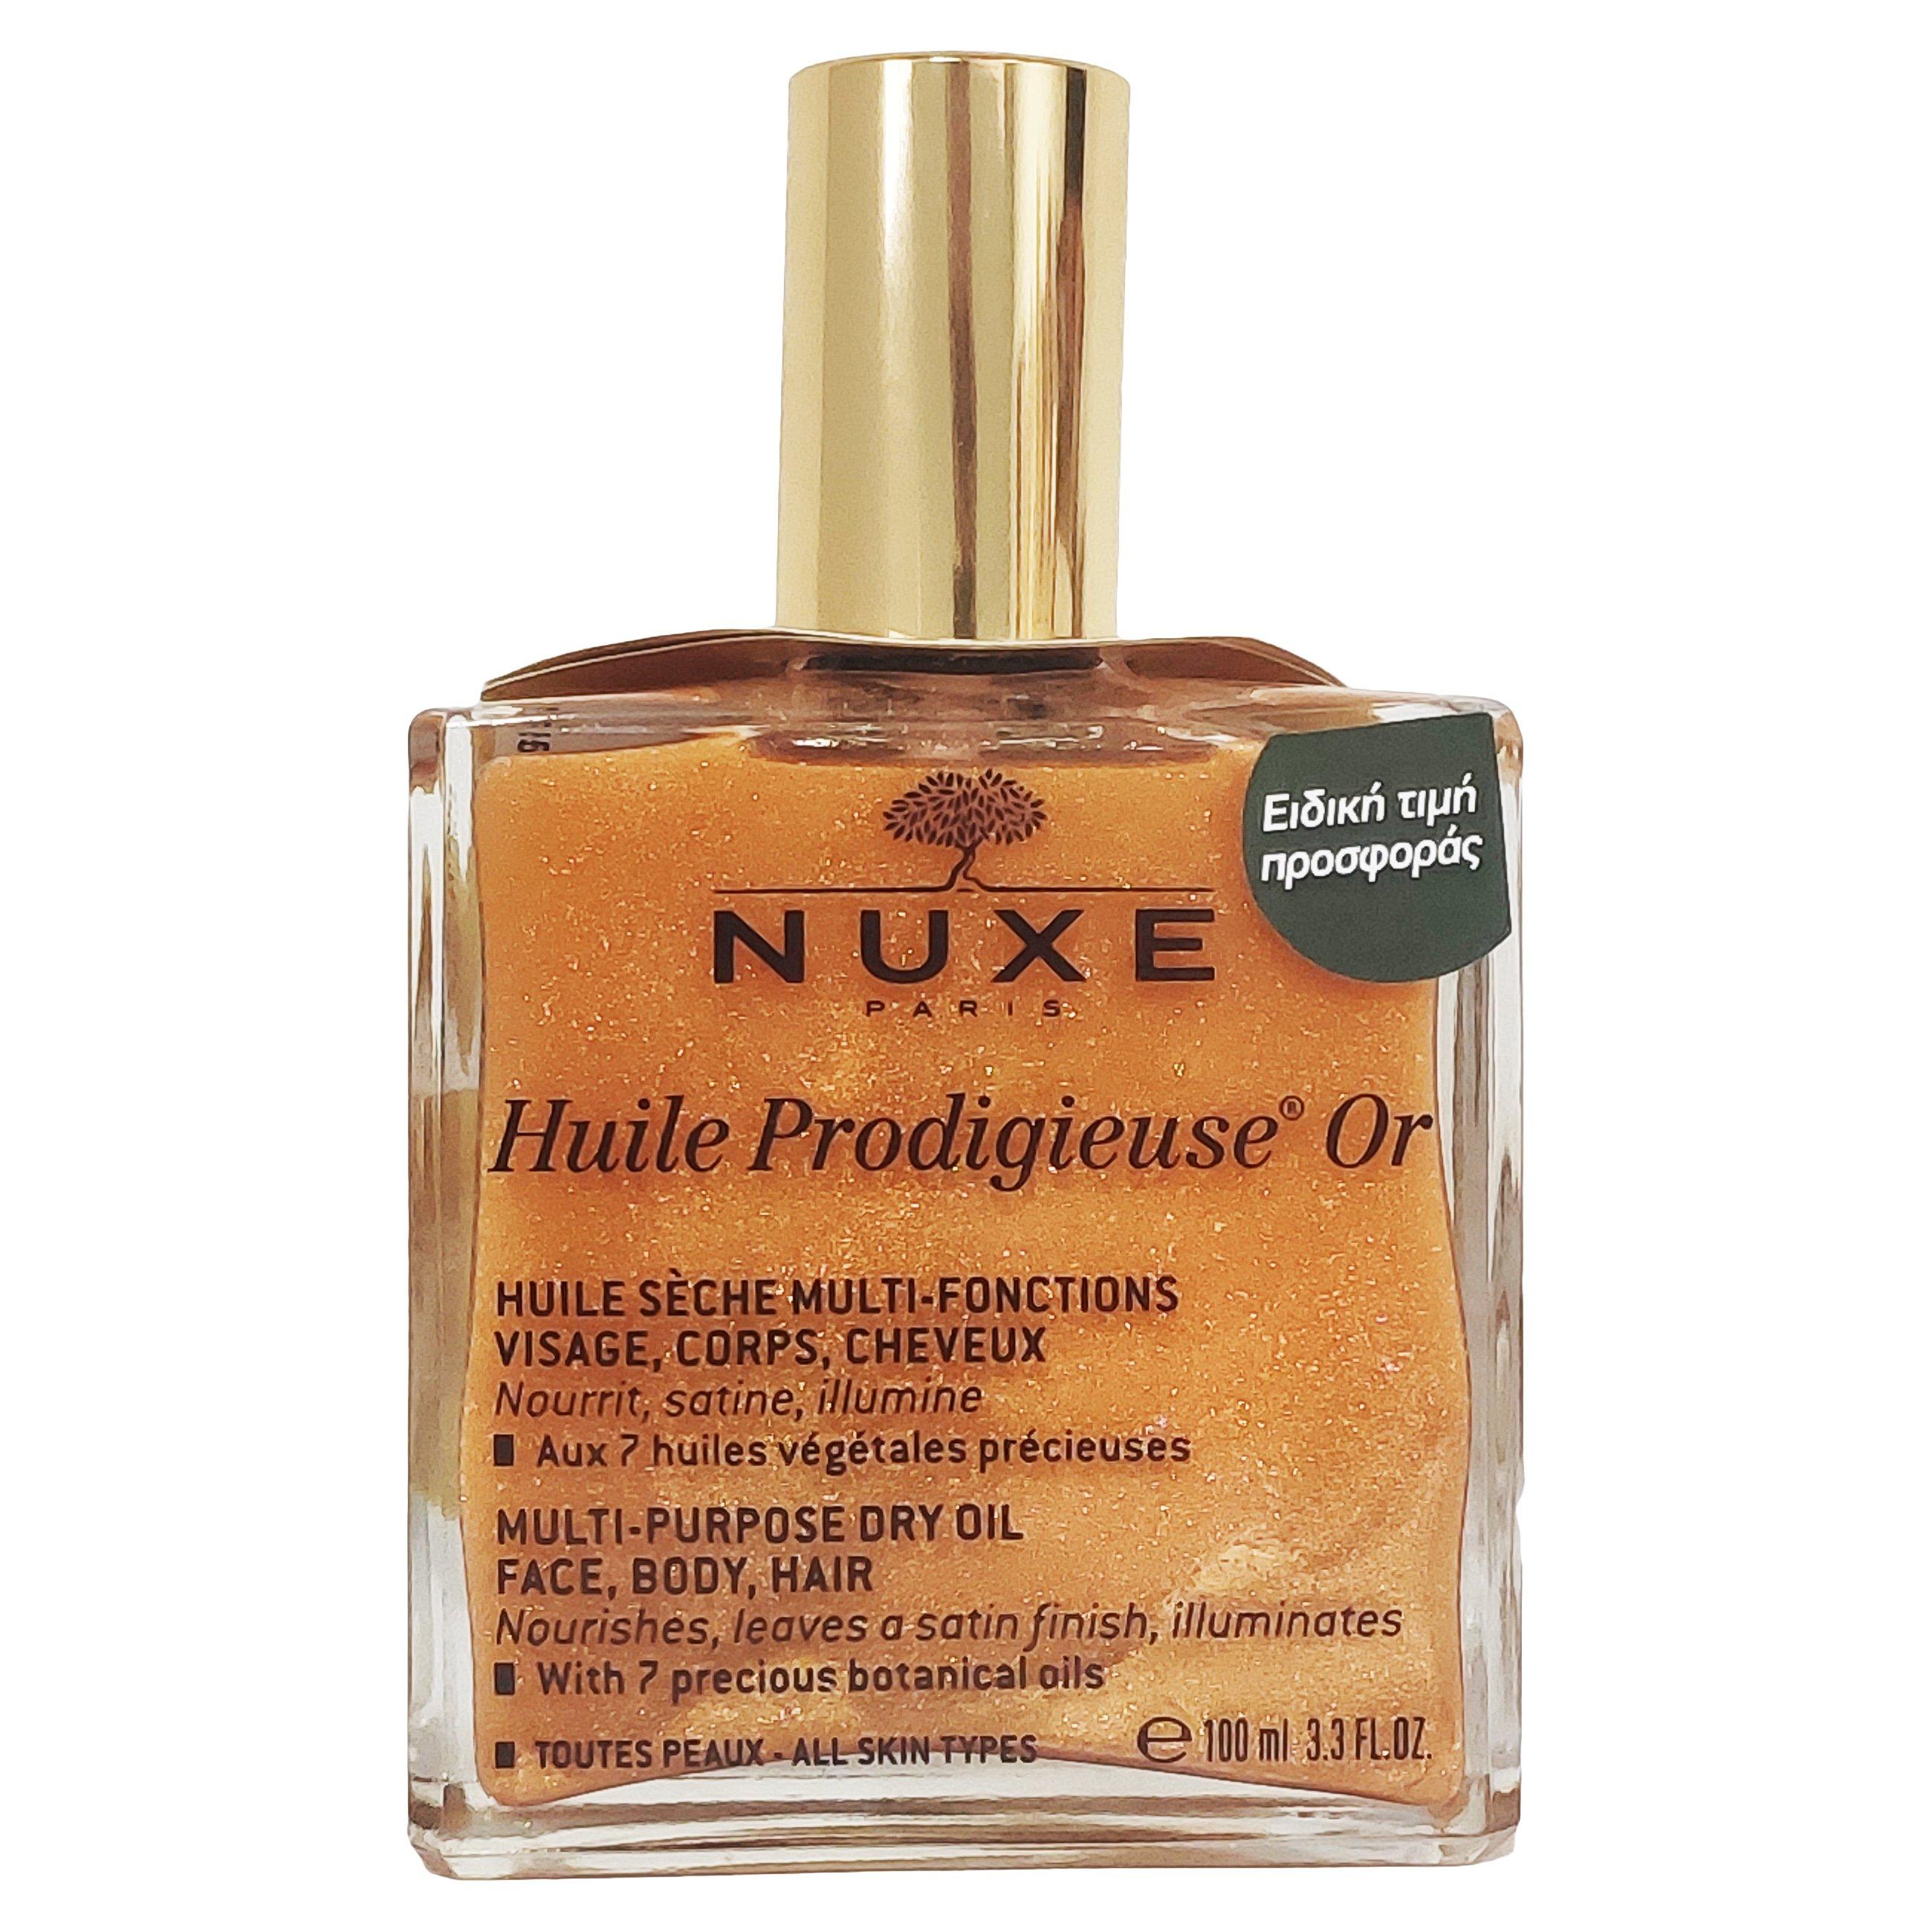 NUXE Huile Prodigieuse OR – Ξηρό Λάδι Ενυδάτωσης και Λάμψης για Πρόσωπο-Σώμα-Μαλλιά με Χρυσαφένια Λάμψη 100ml